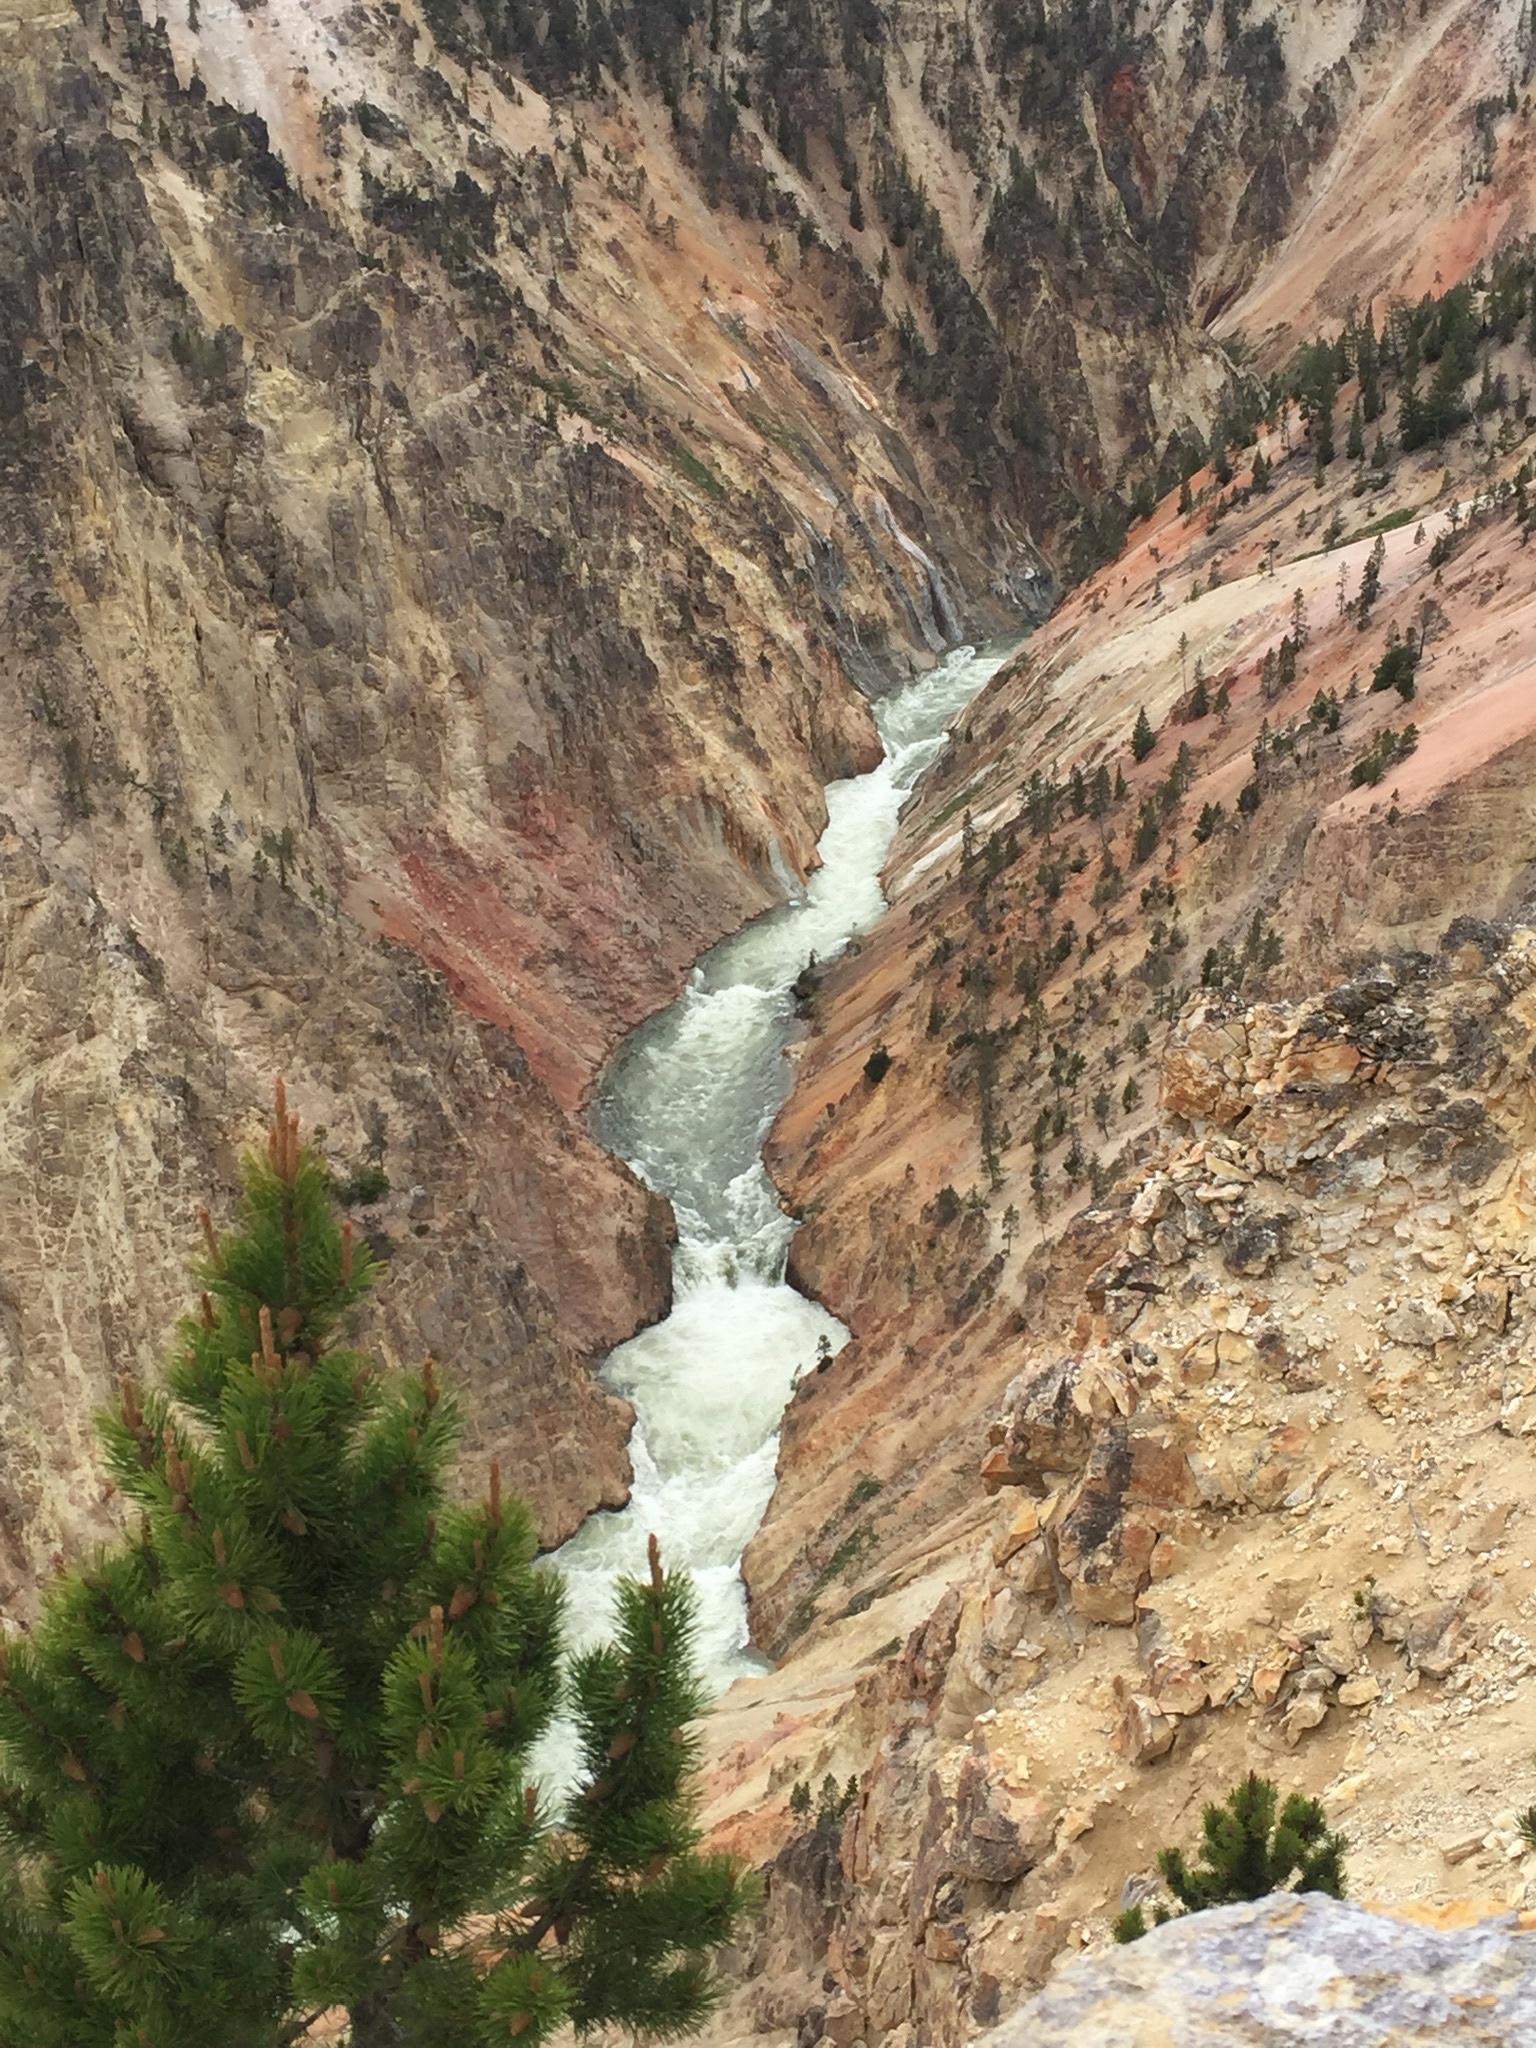 Upper Fall, Artist Point Yellowstone